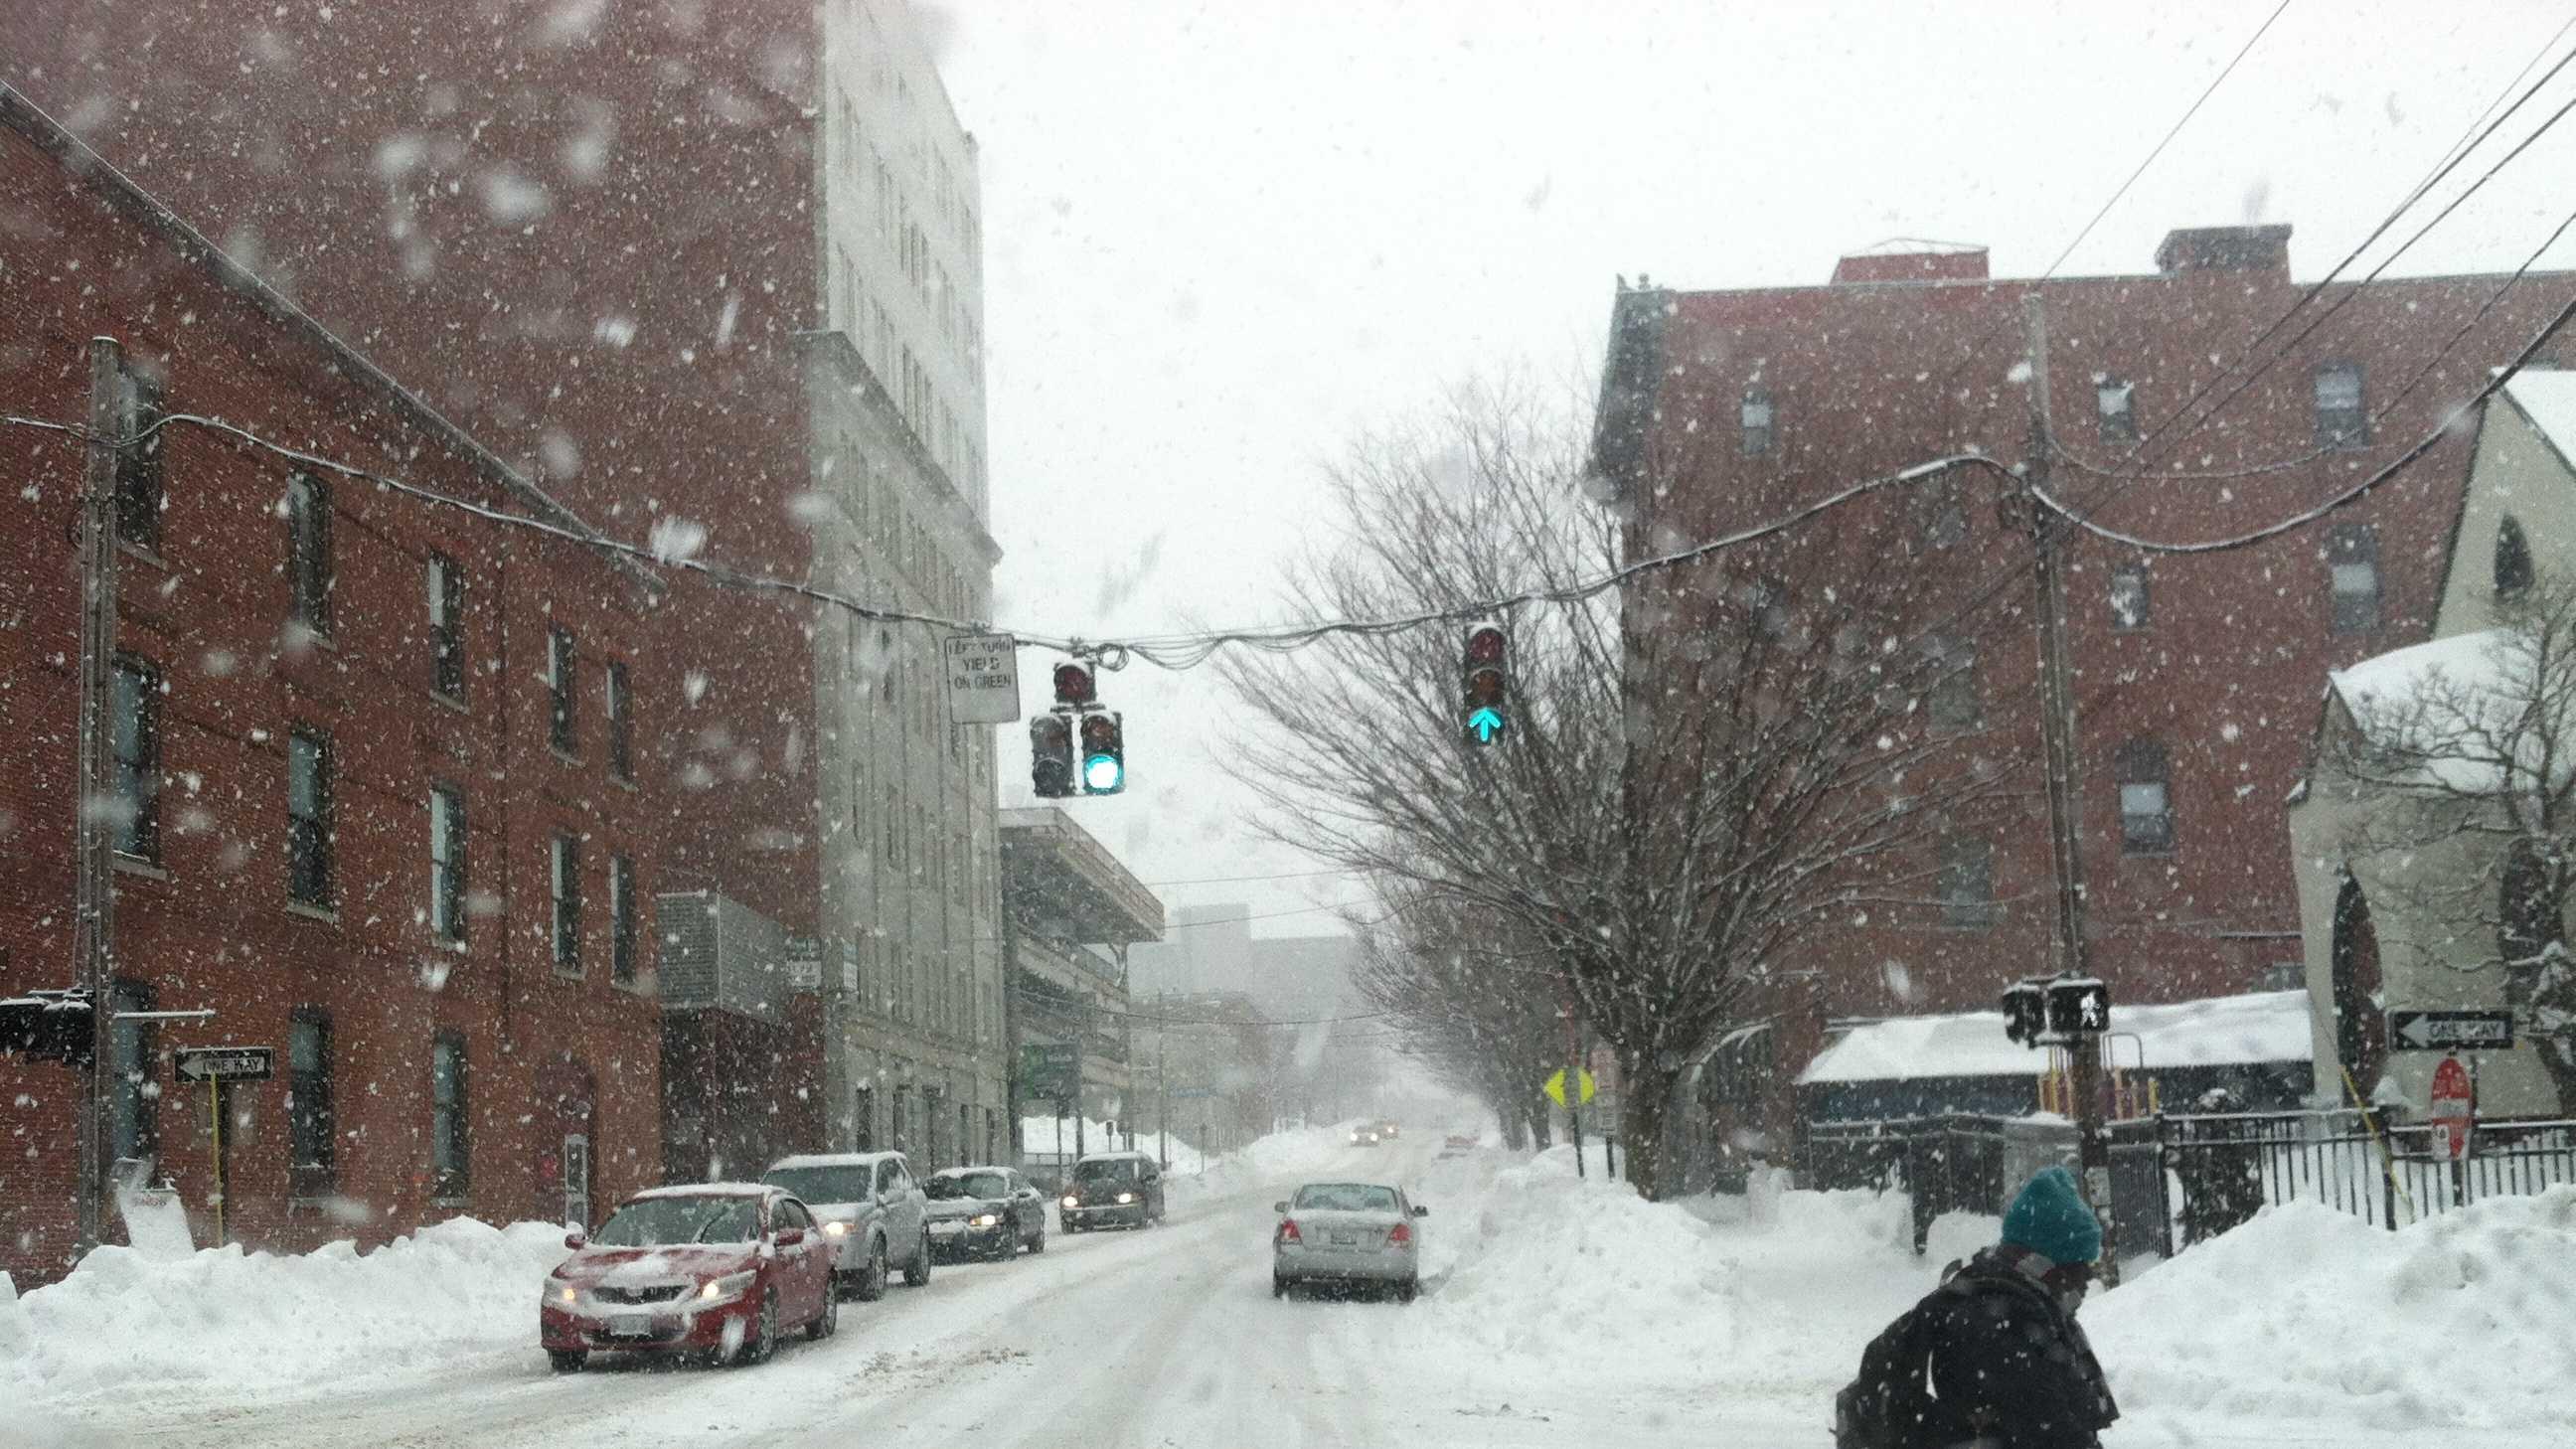 The scene in Portland at 12:45 p.m.